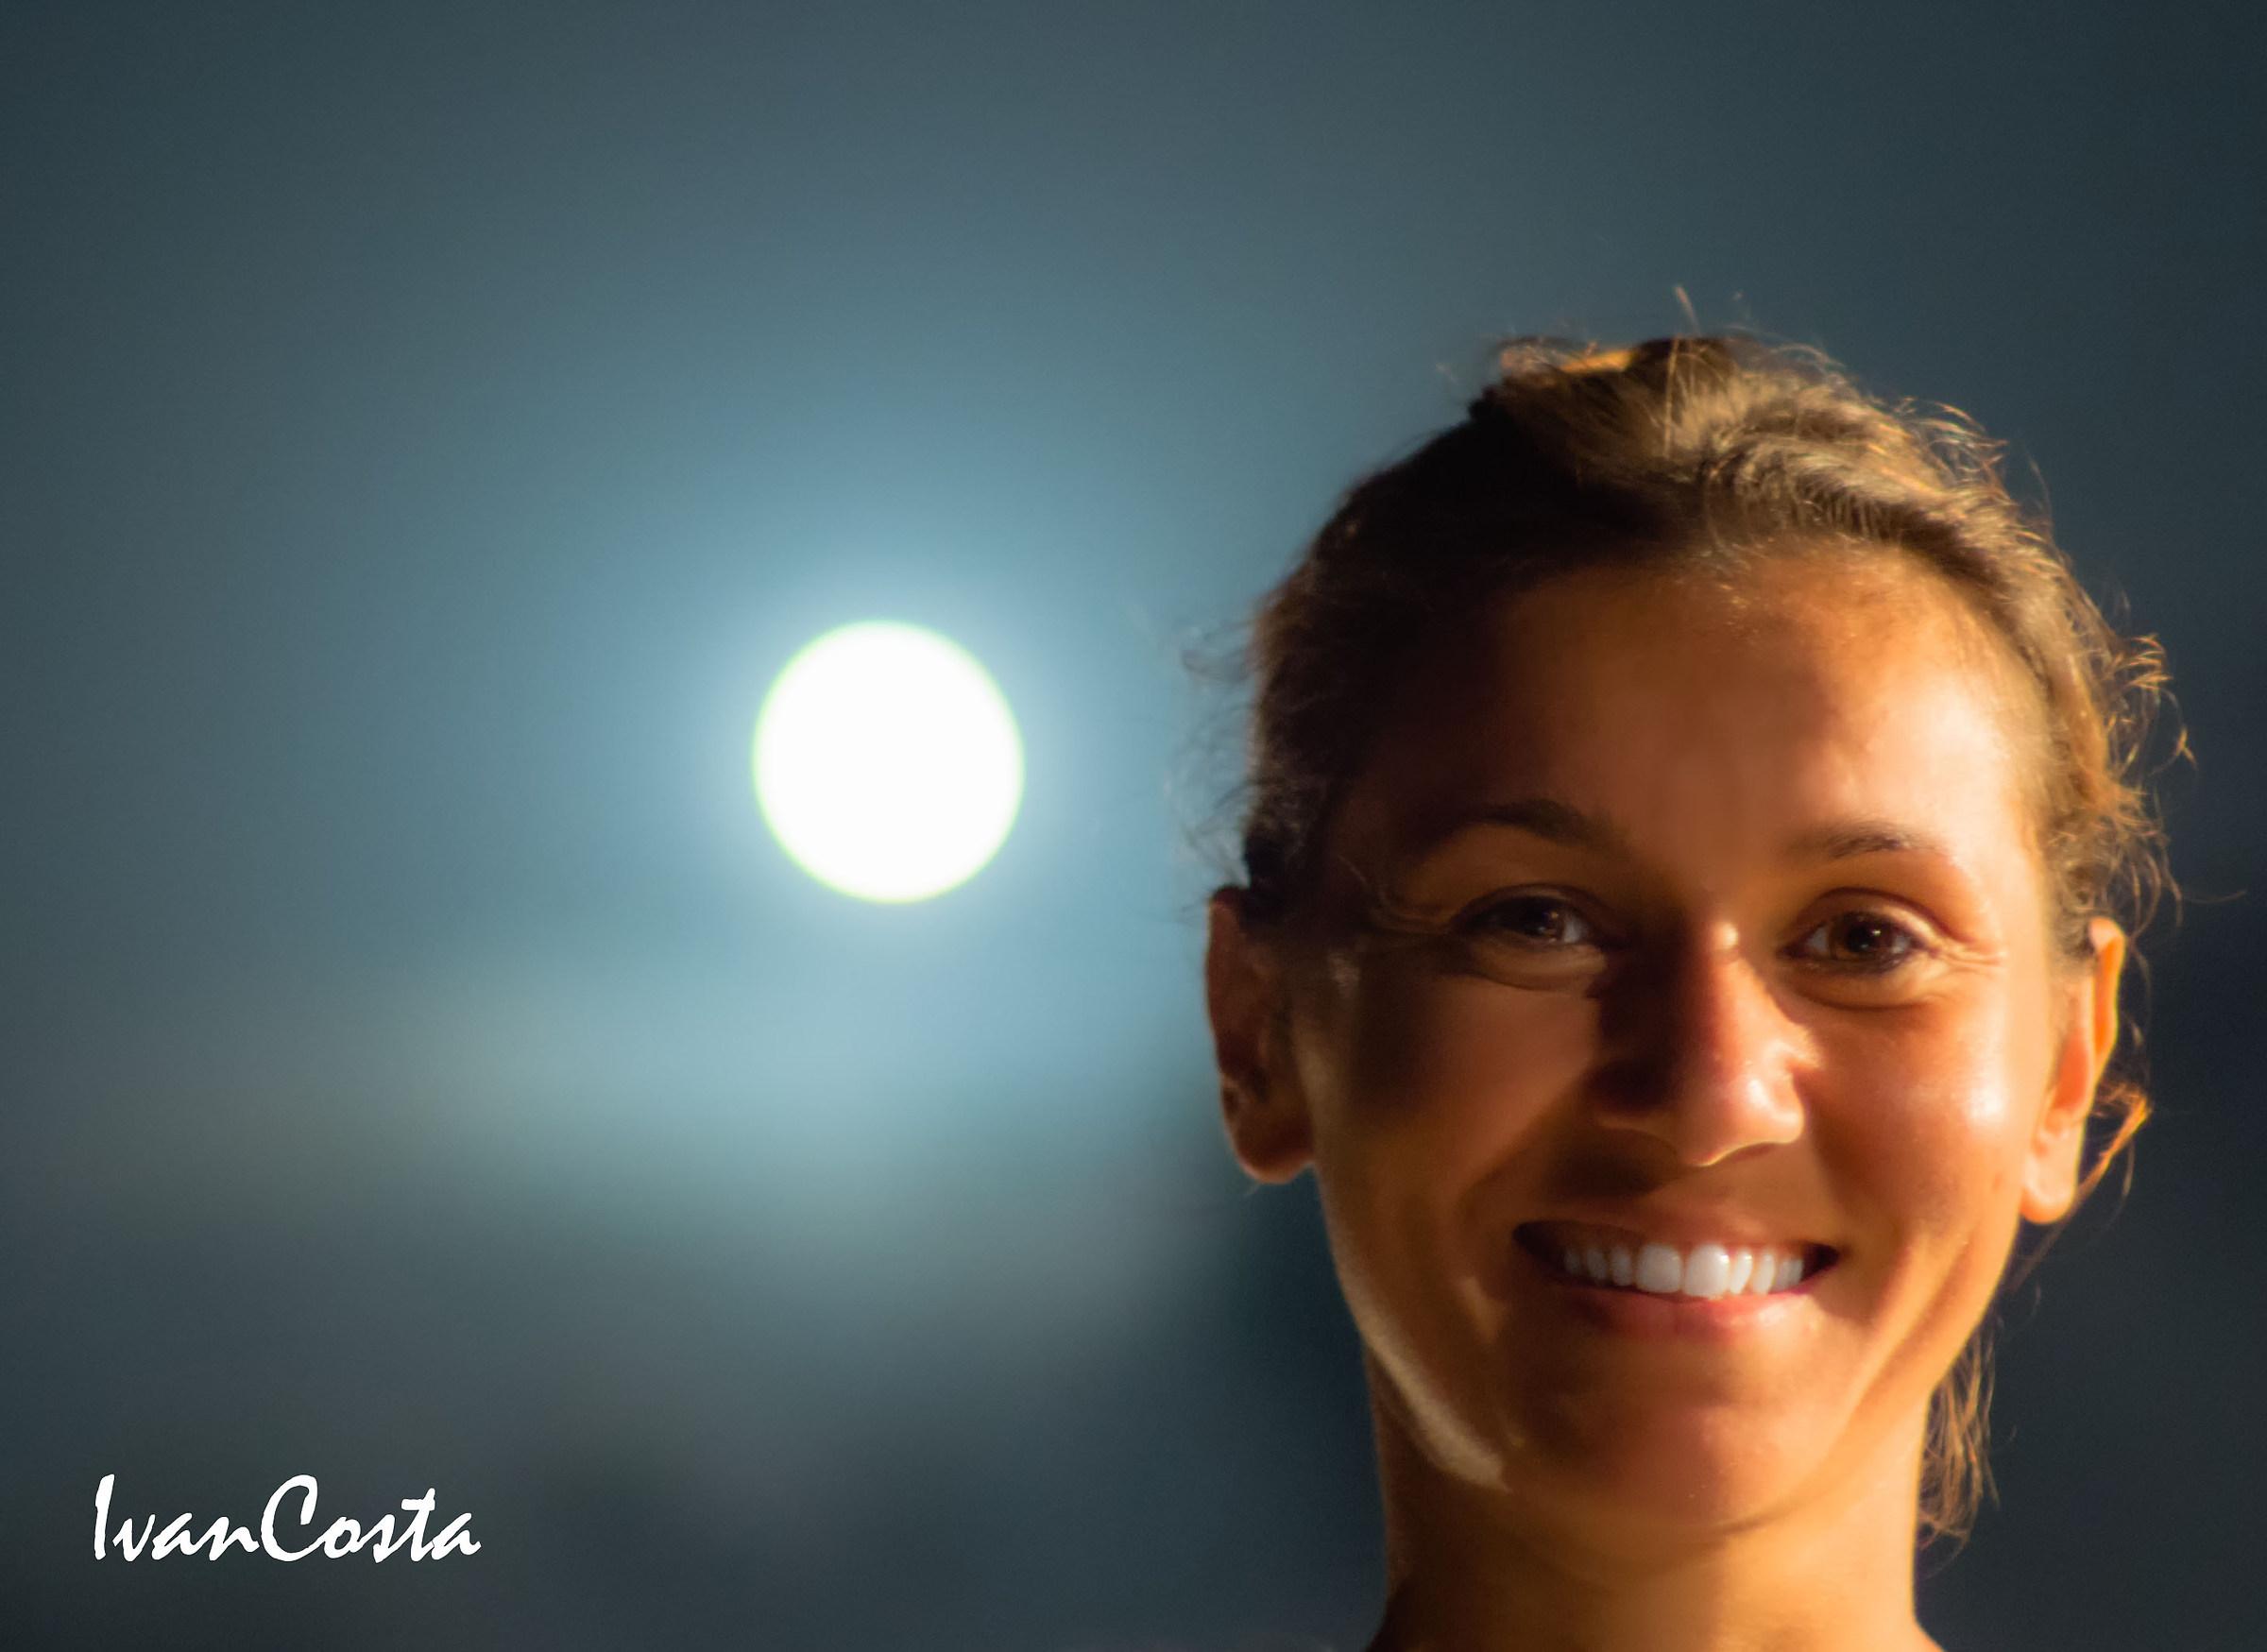 Bellezza al chiar di luna...